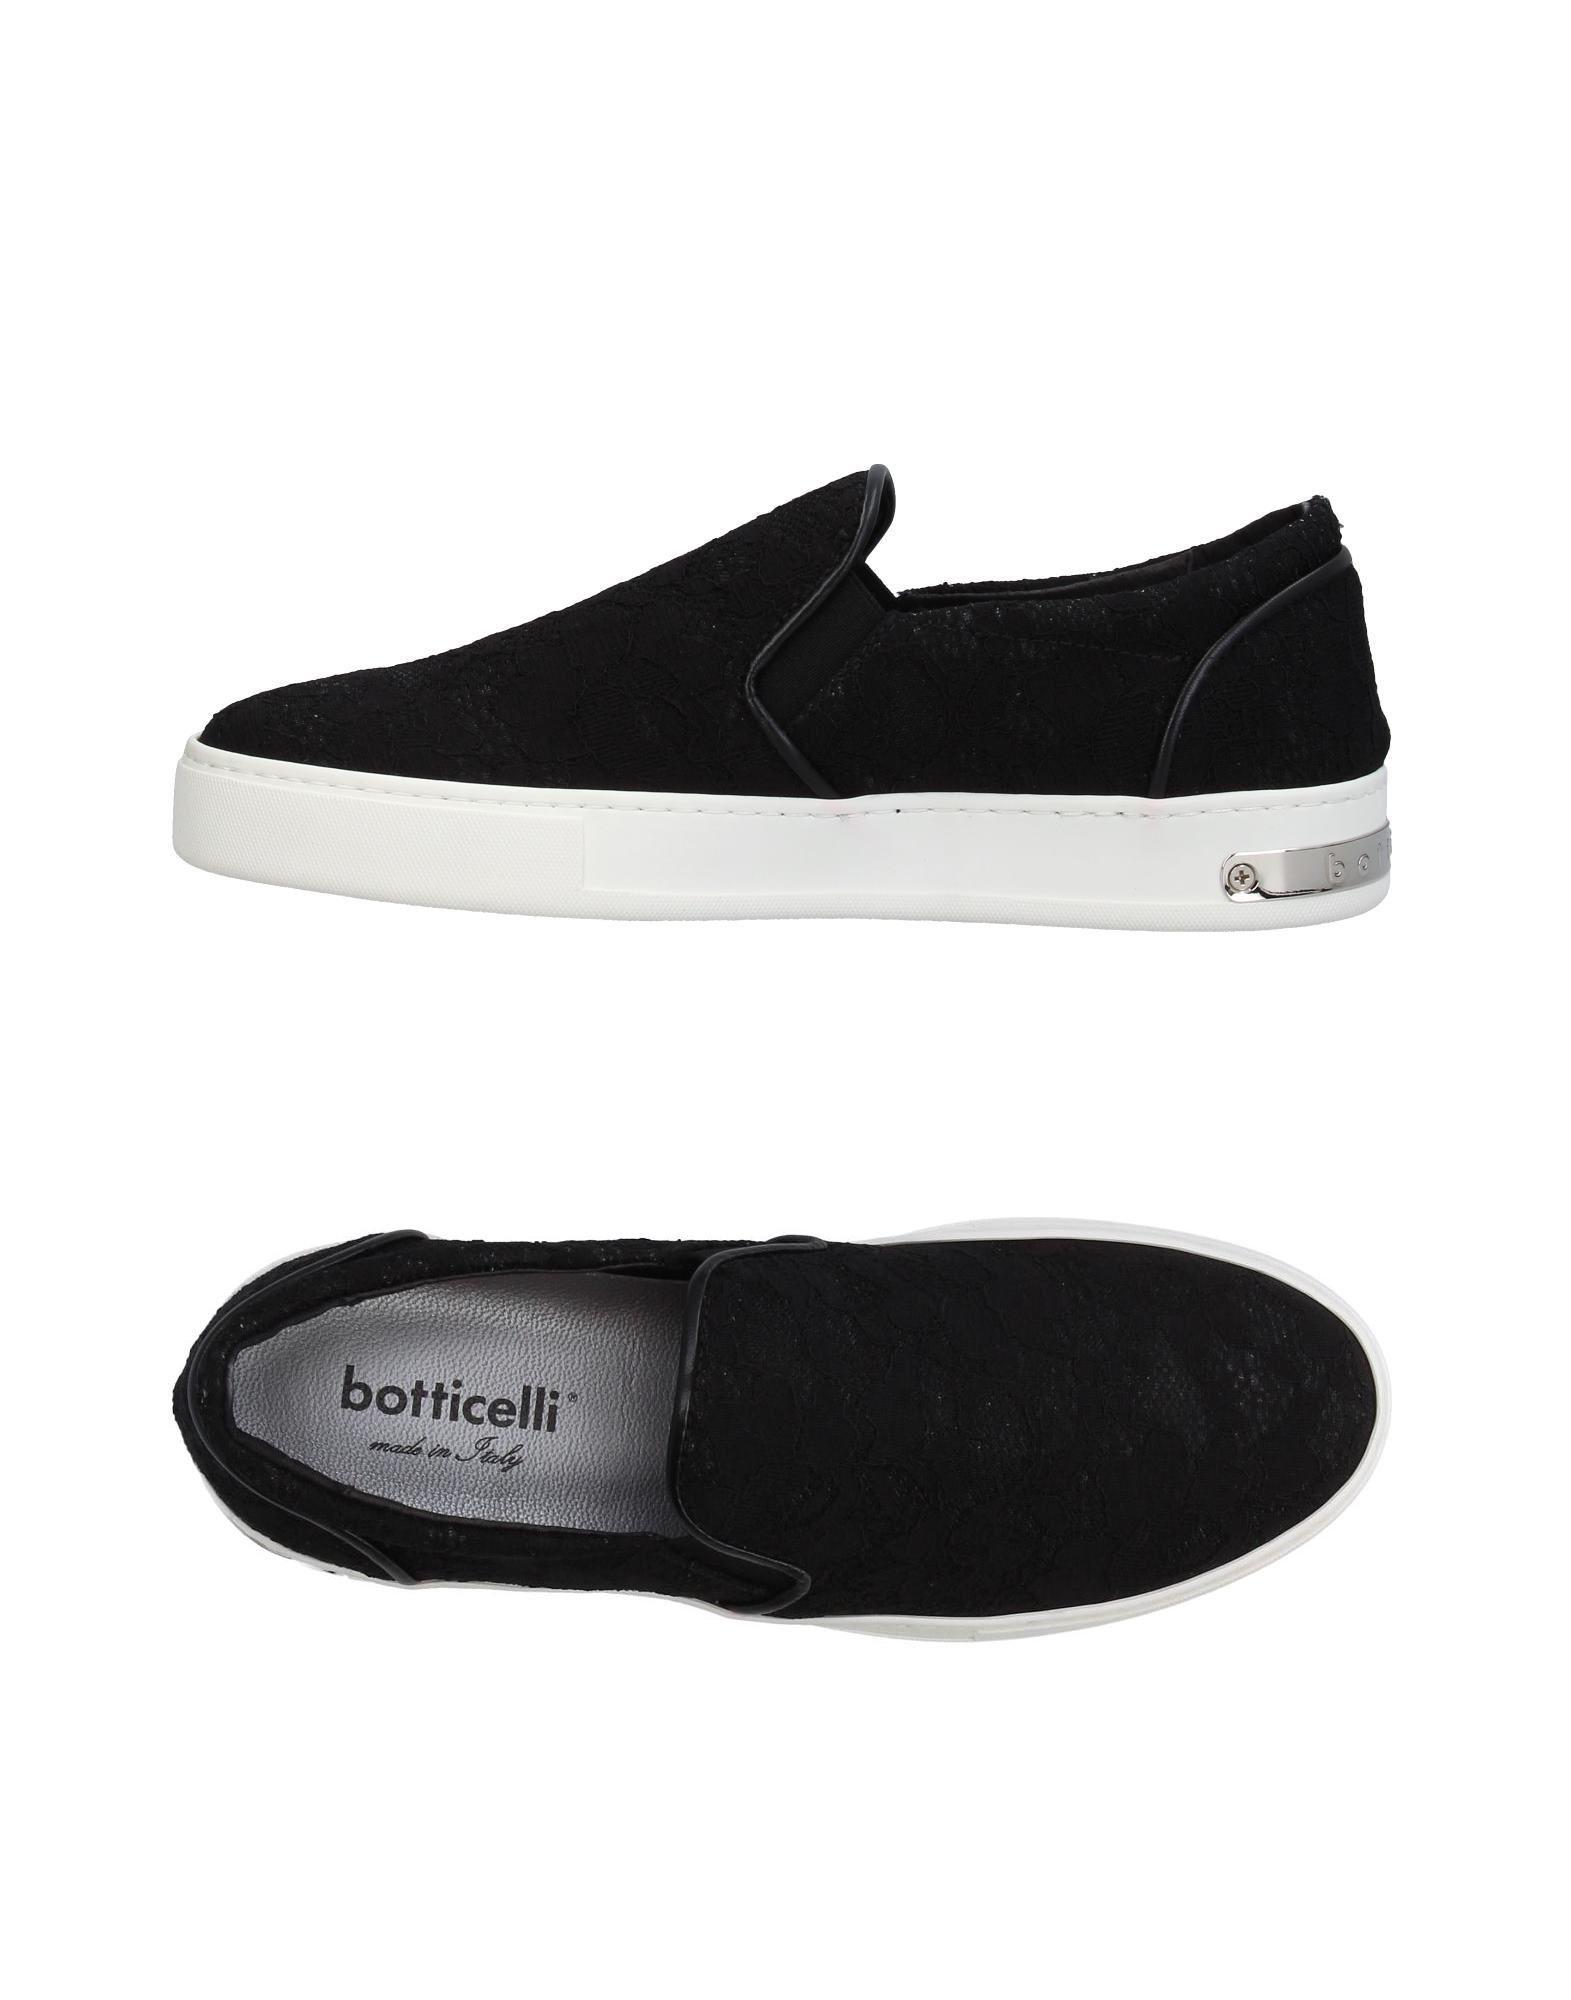 Roberto Botticelli Sneakers Damen  11406100SF Gute Qualität beliebte Schuhe